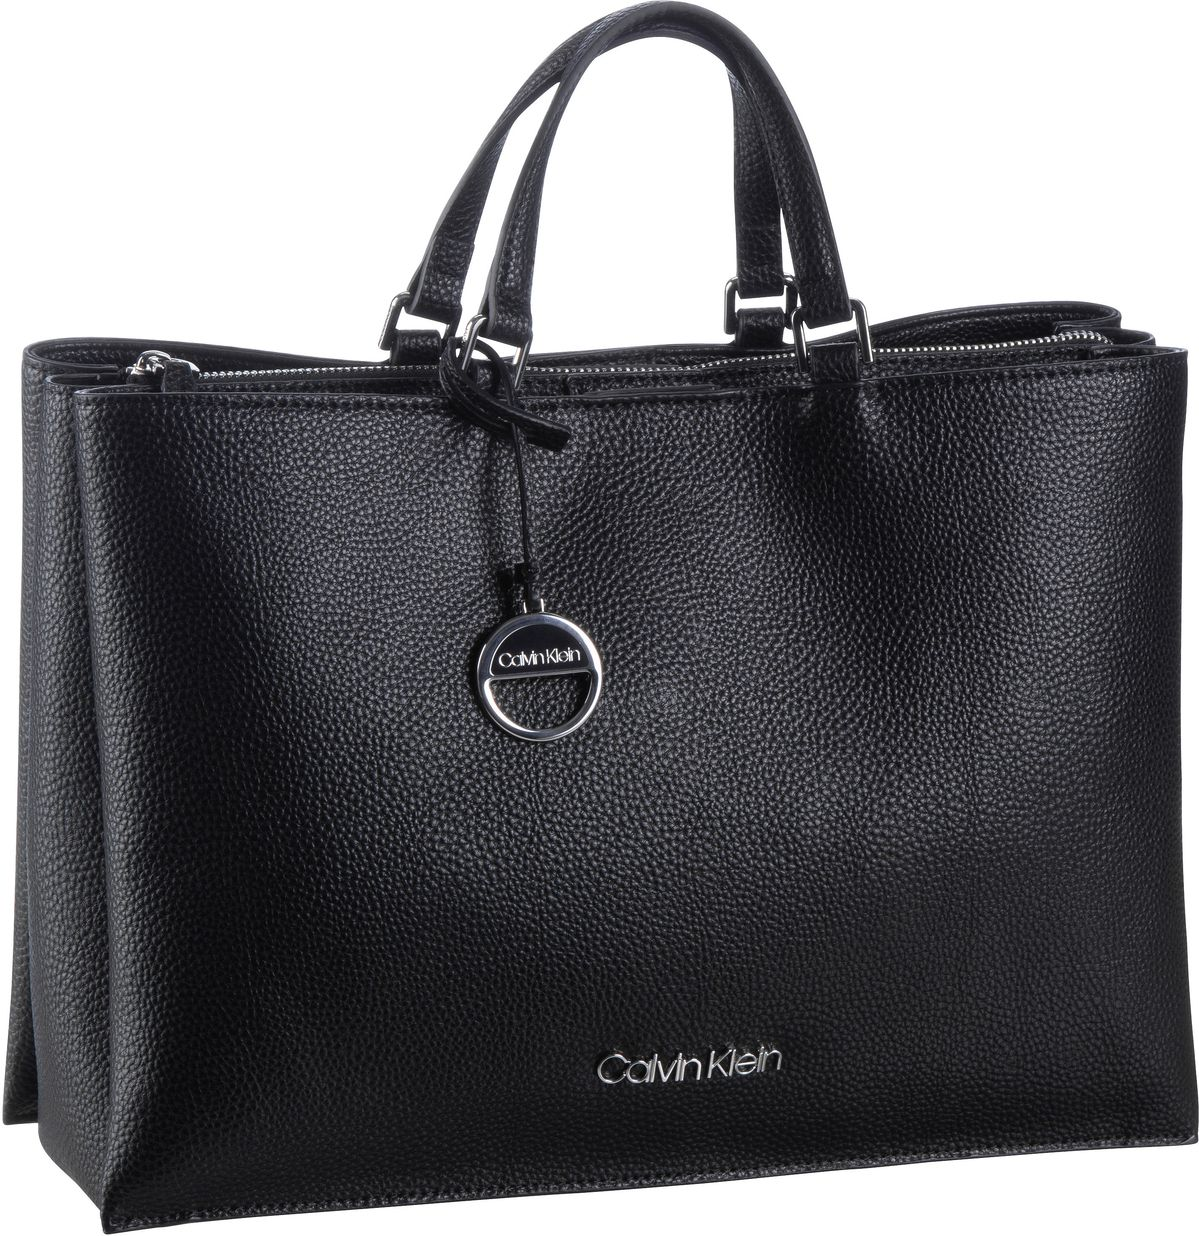 Handtasche Sided Tote SP20 Black